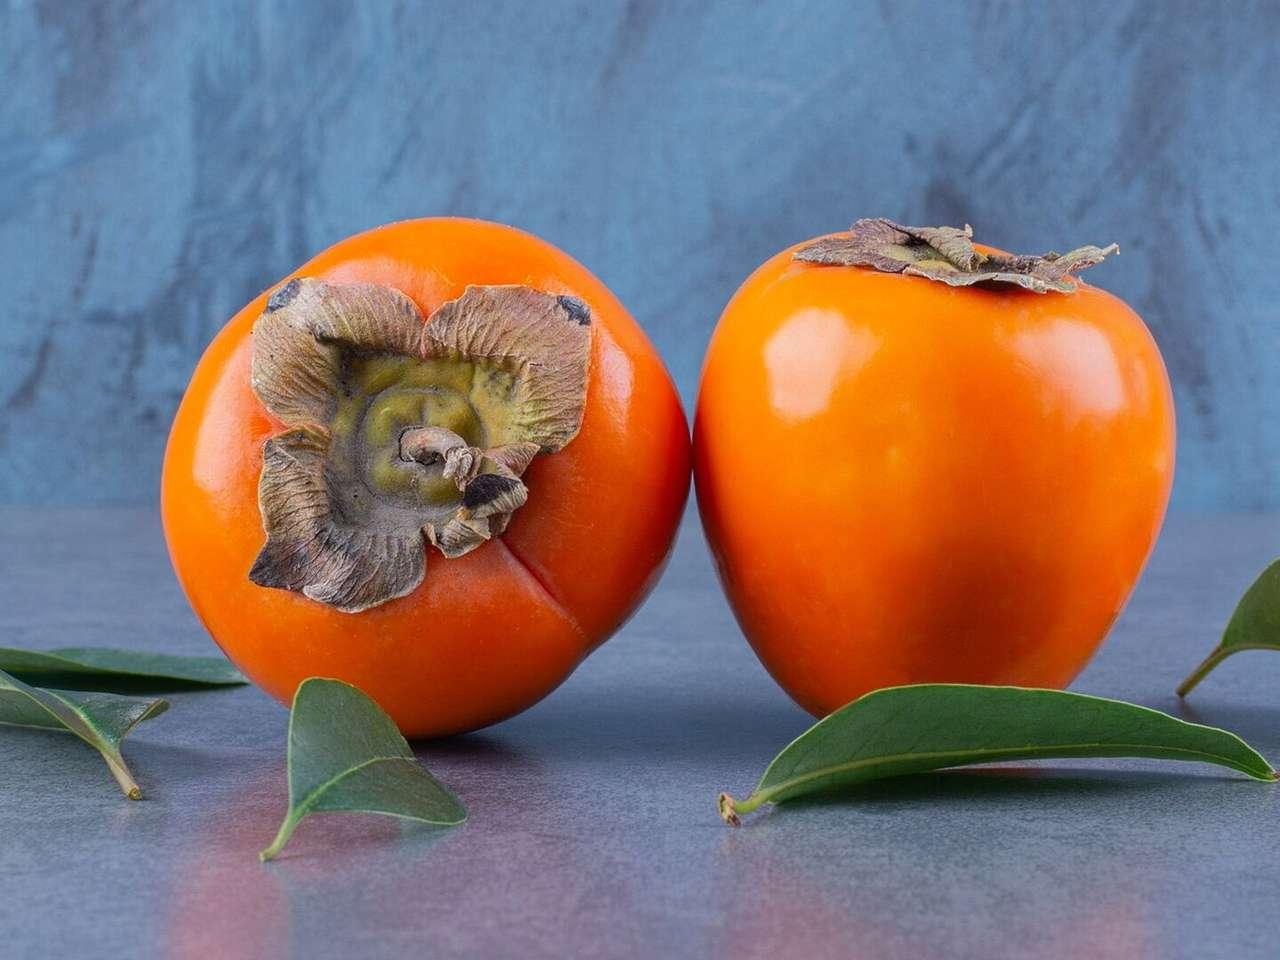 Fruta kaki rompecabezas en línea